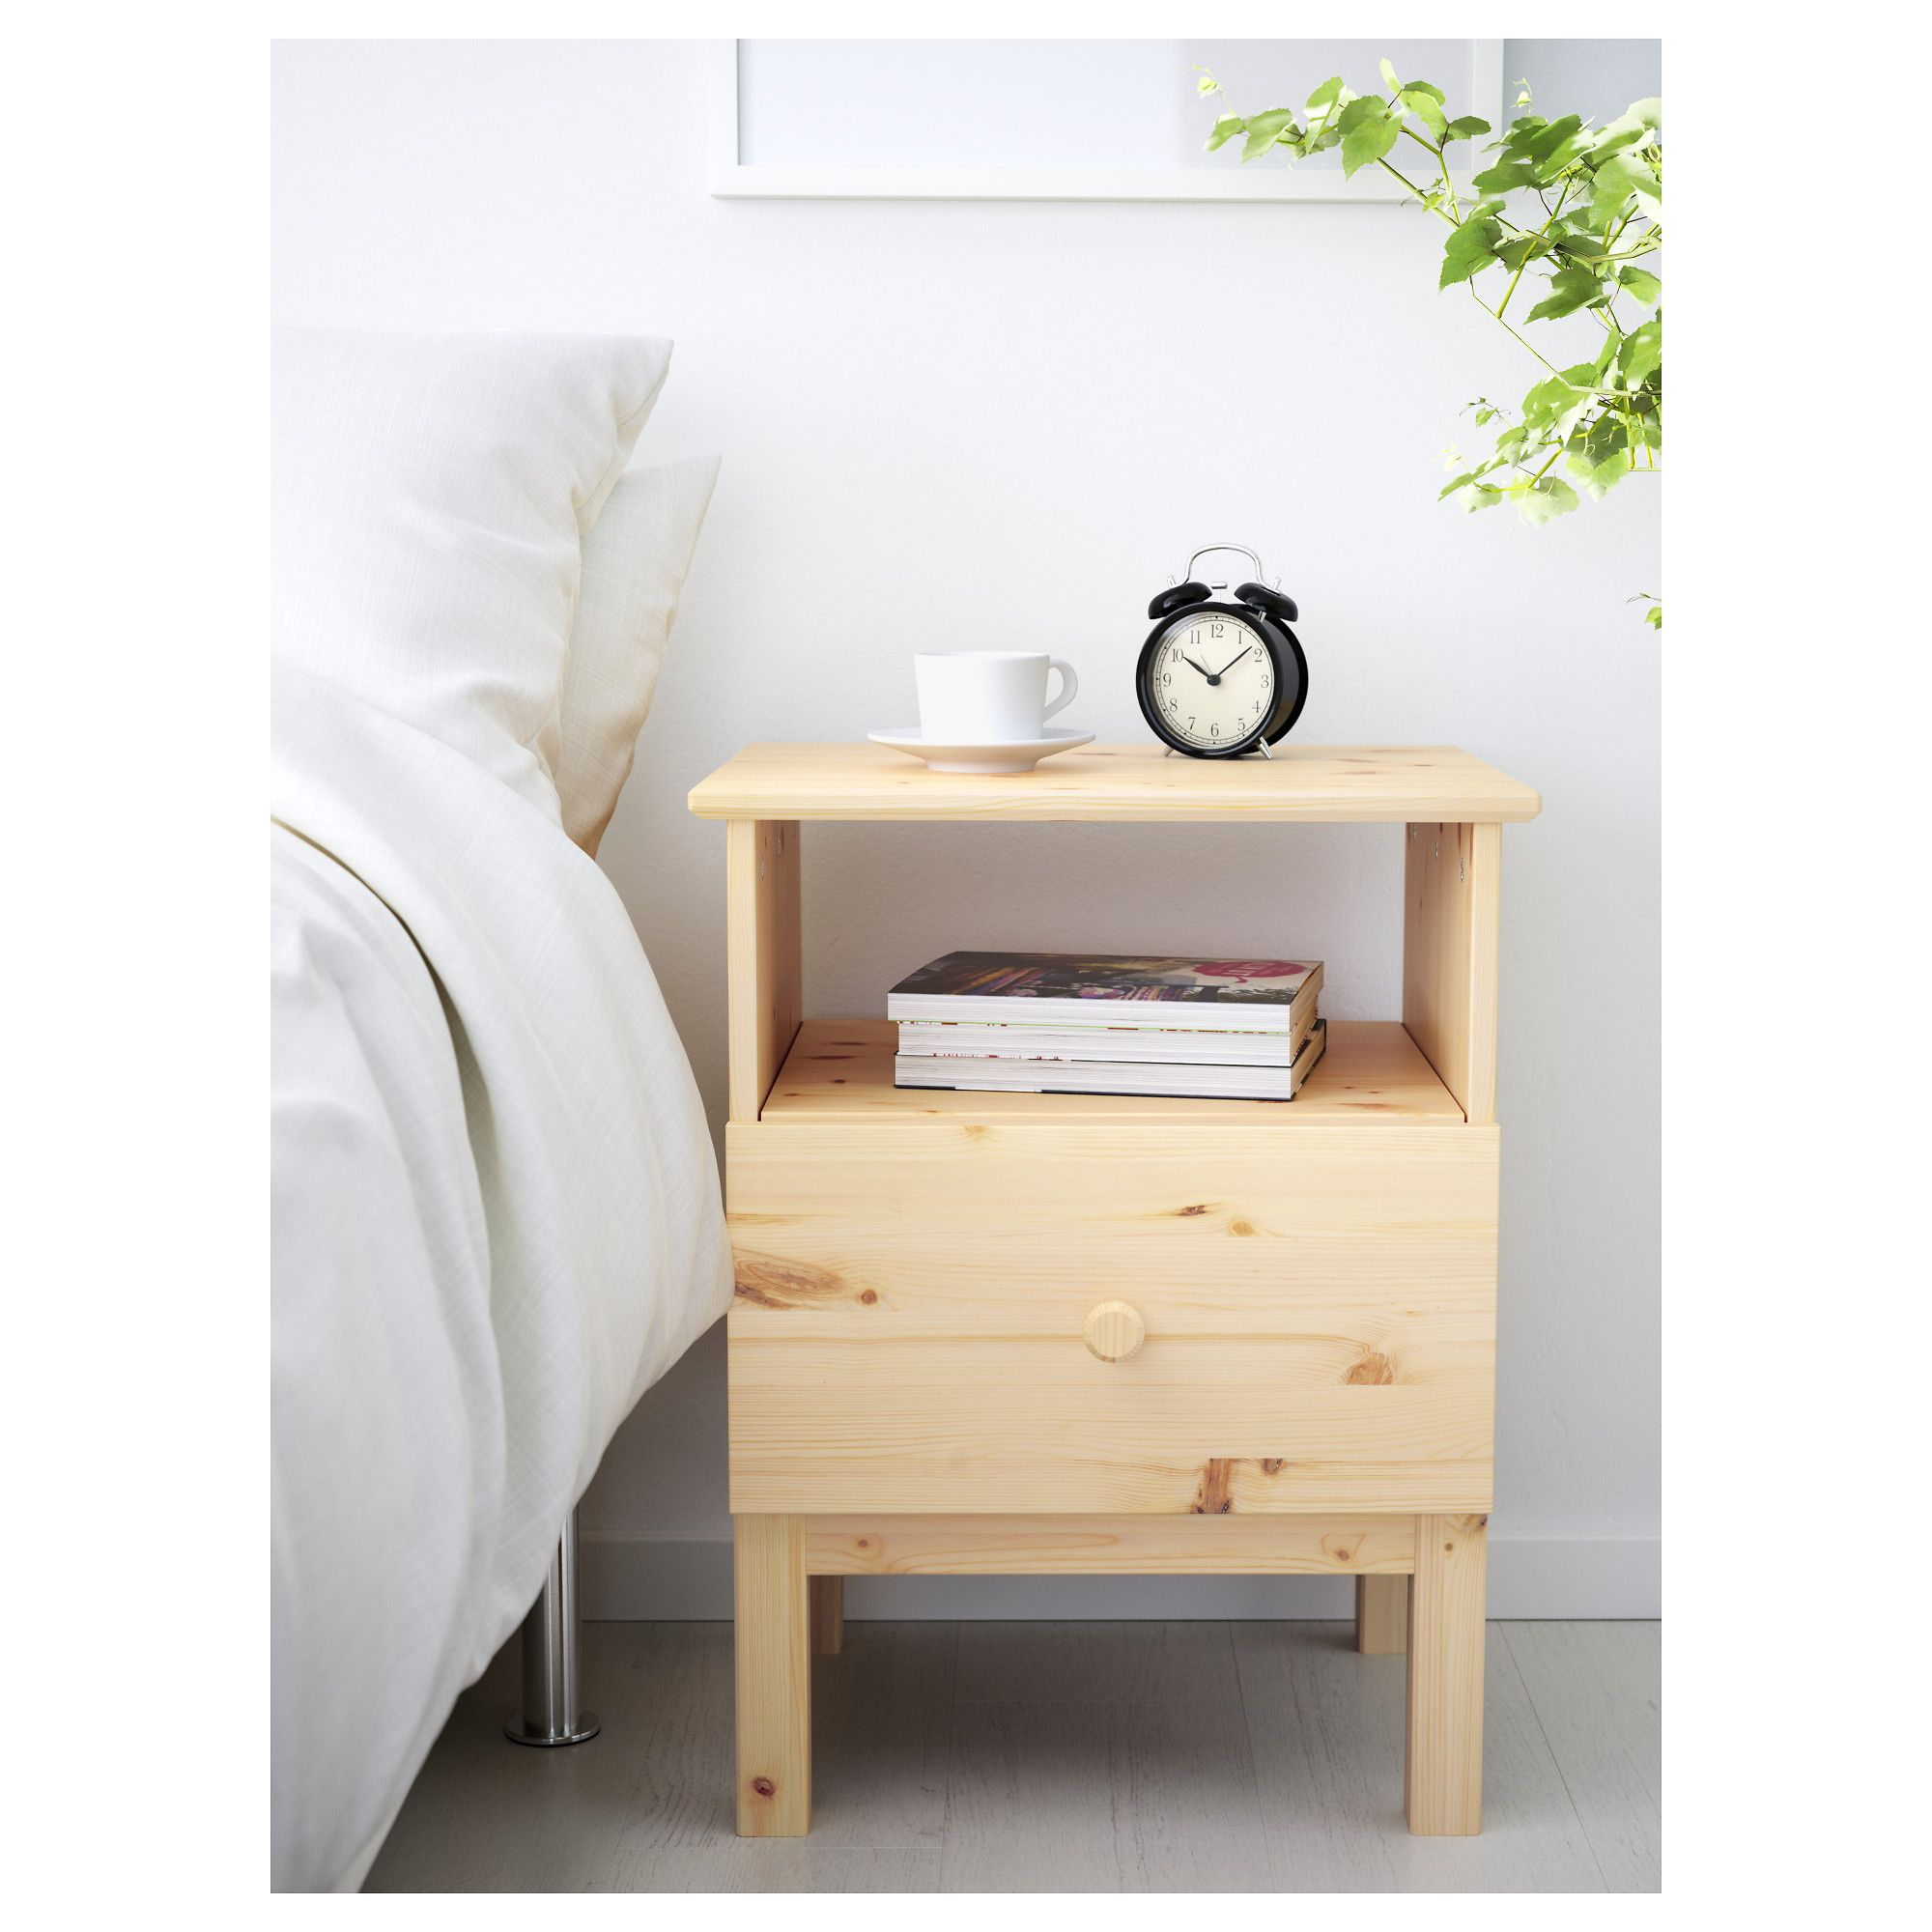 TARVA Bedside table Pine IKEA Bedside table ikea